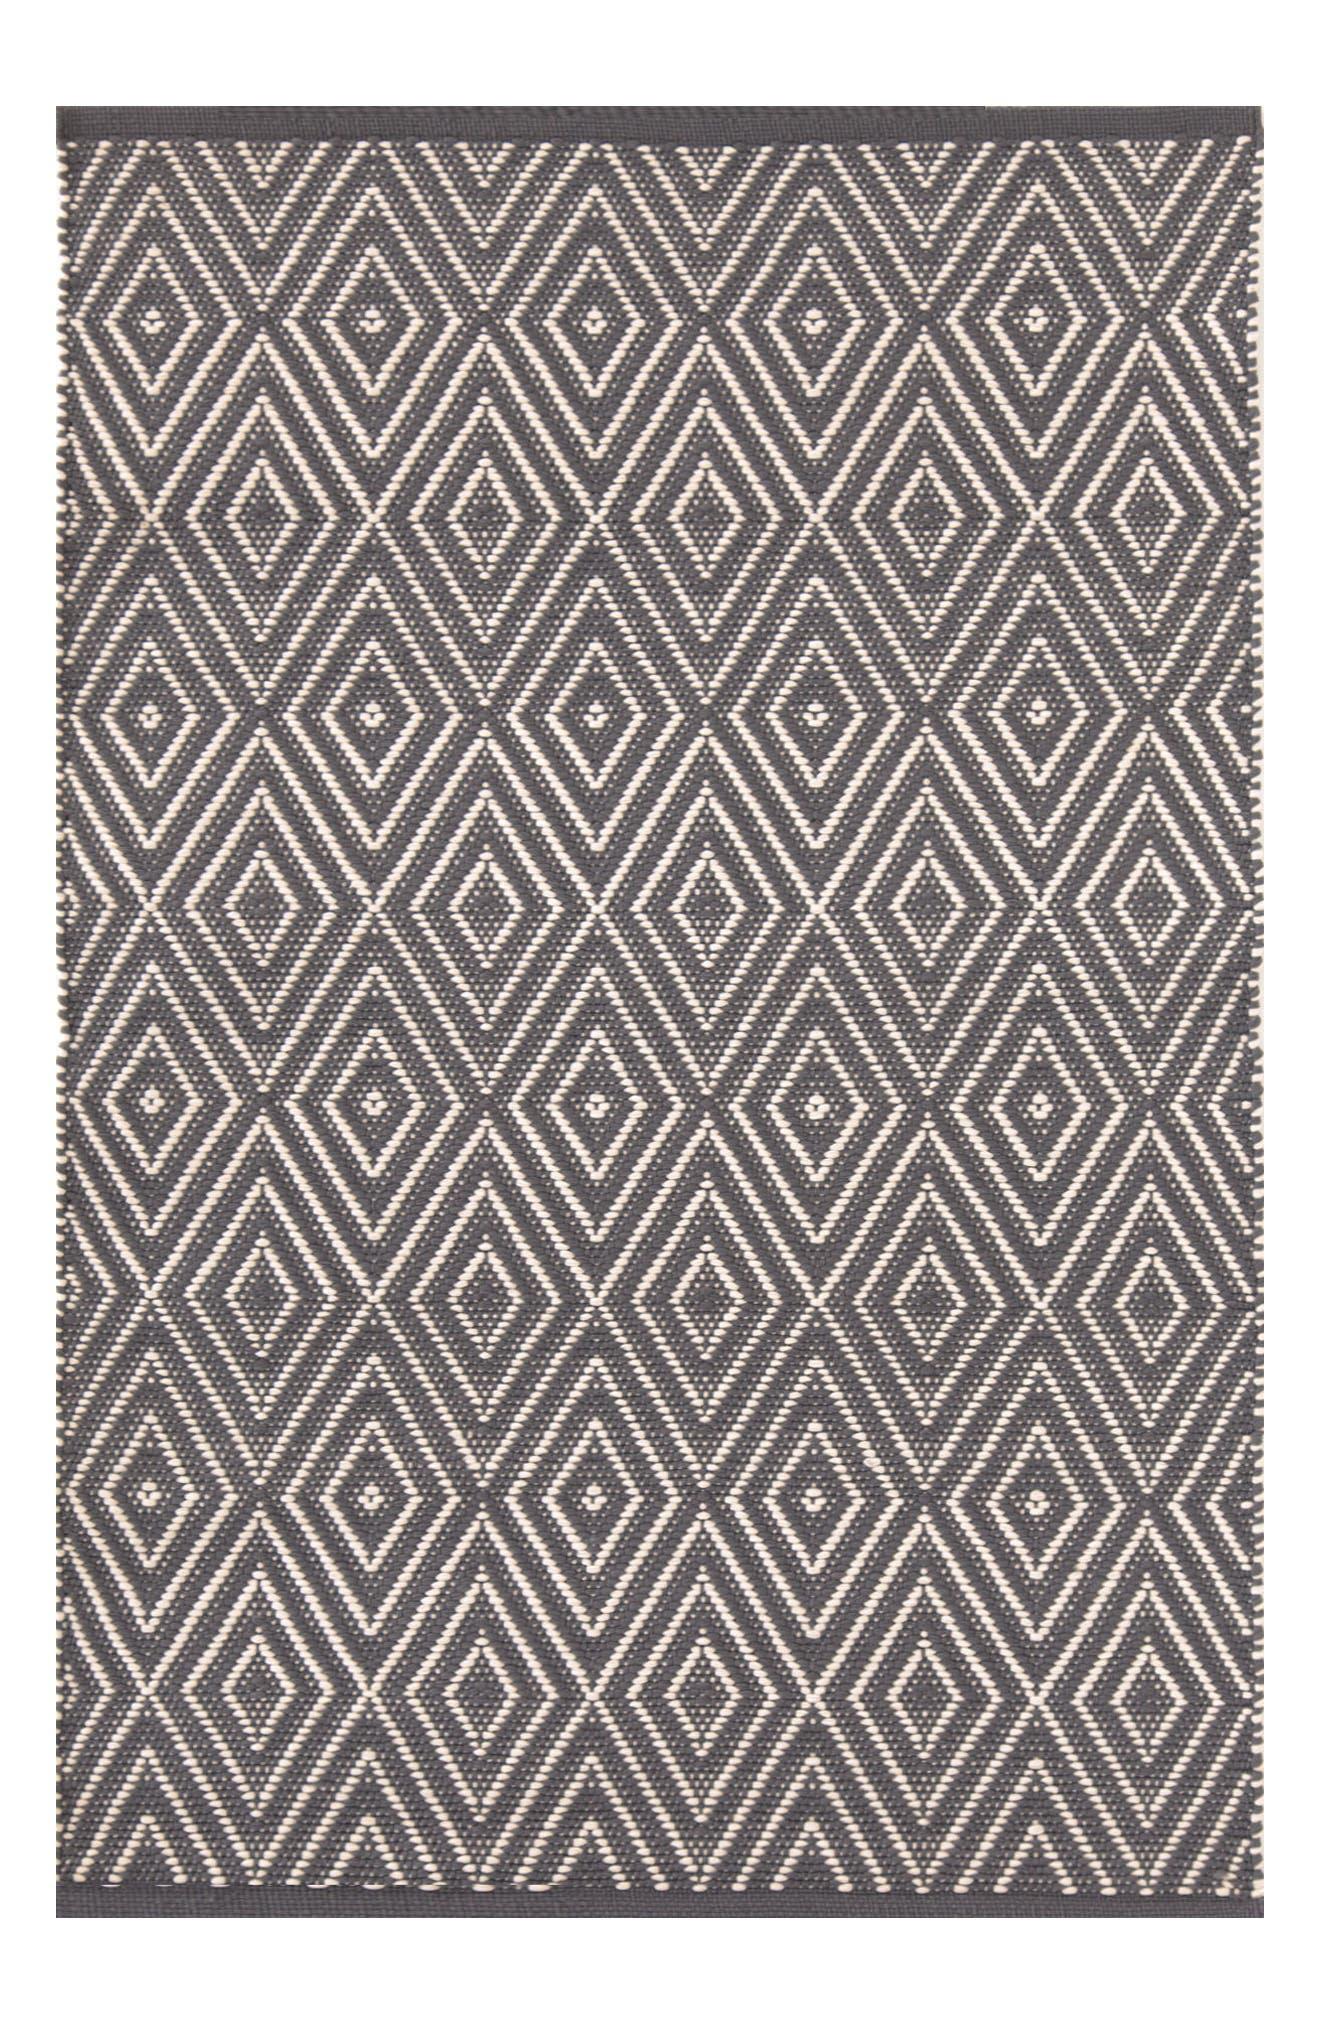 Diamond Print Rug,                             Main thumbnail 1, color,                             GREY